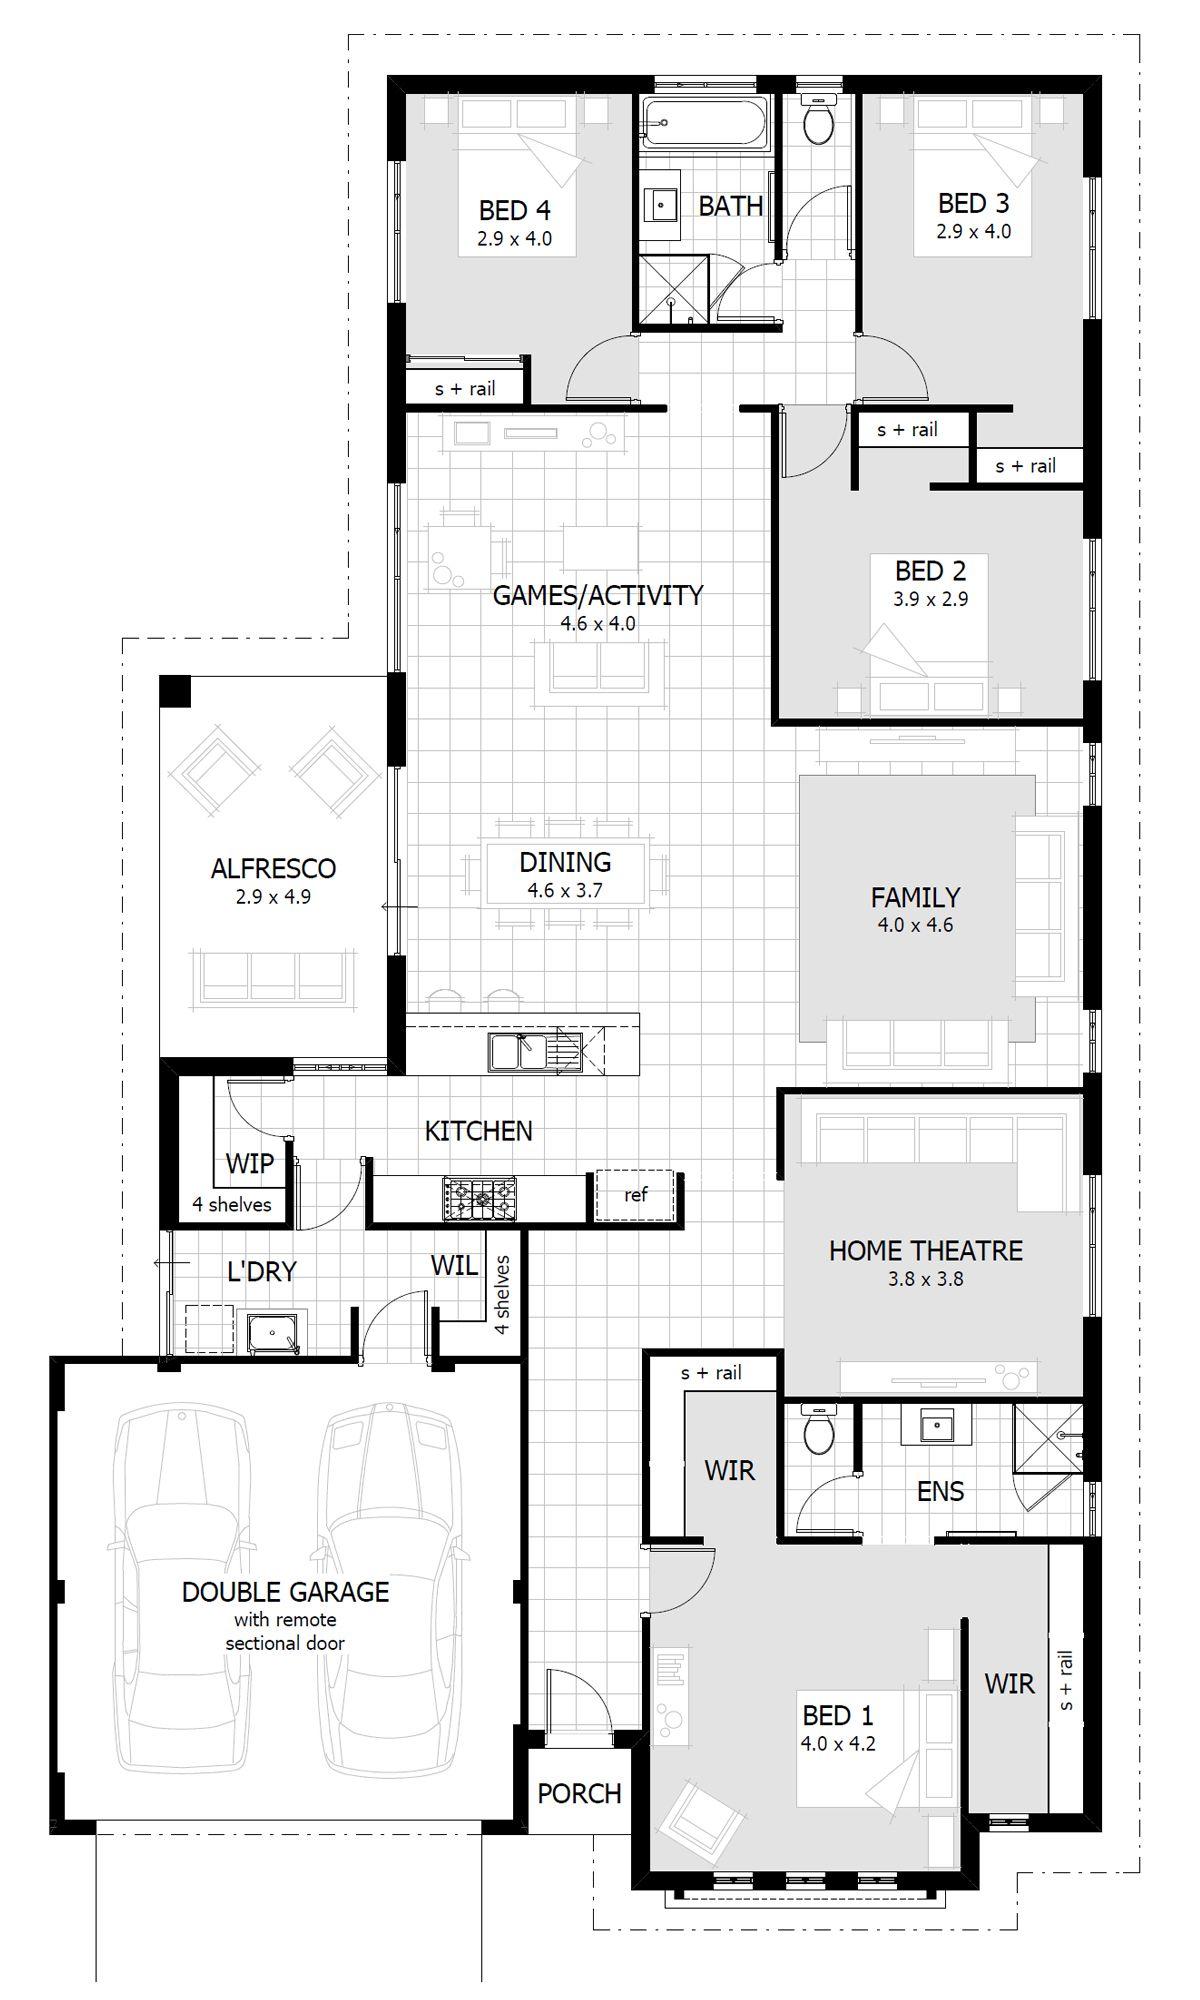 New home designs perth wa single storey house plans also rh pinterest